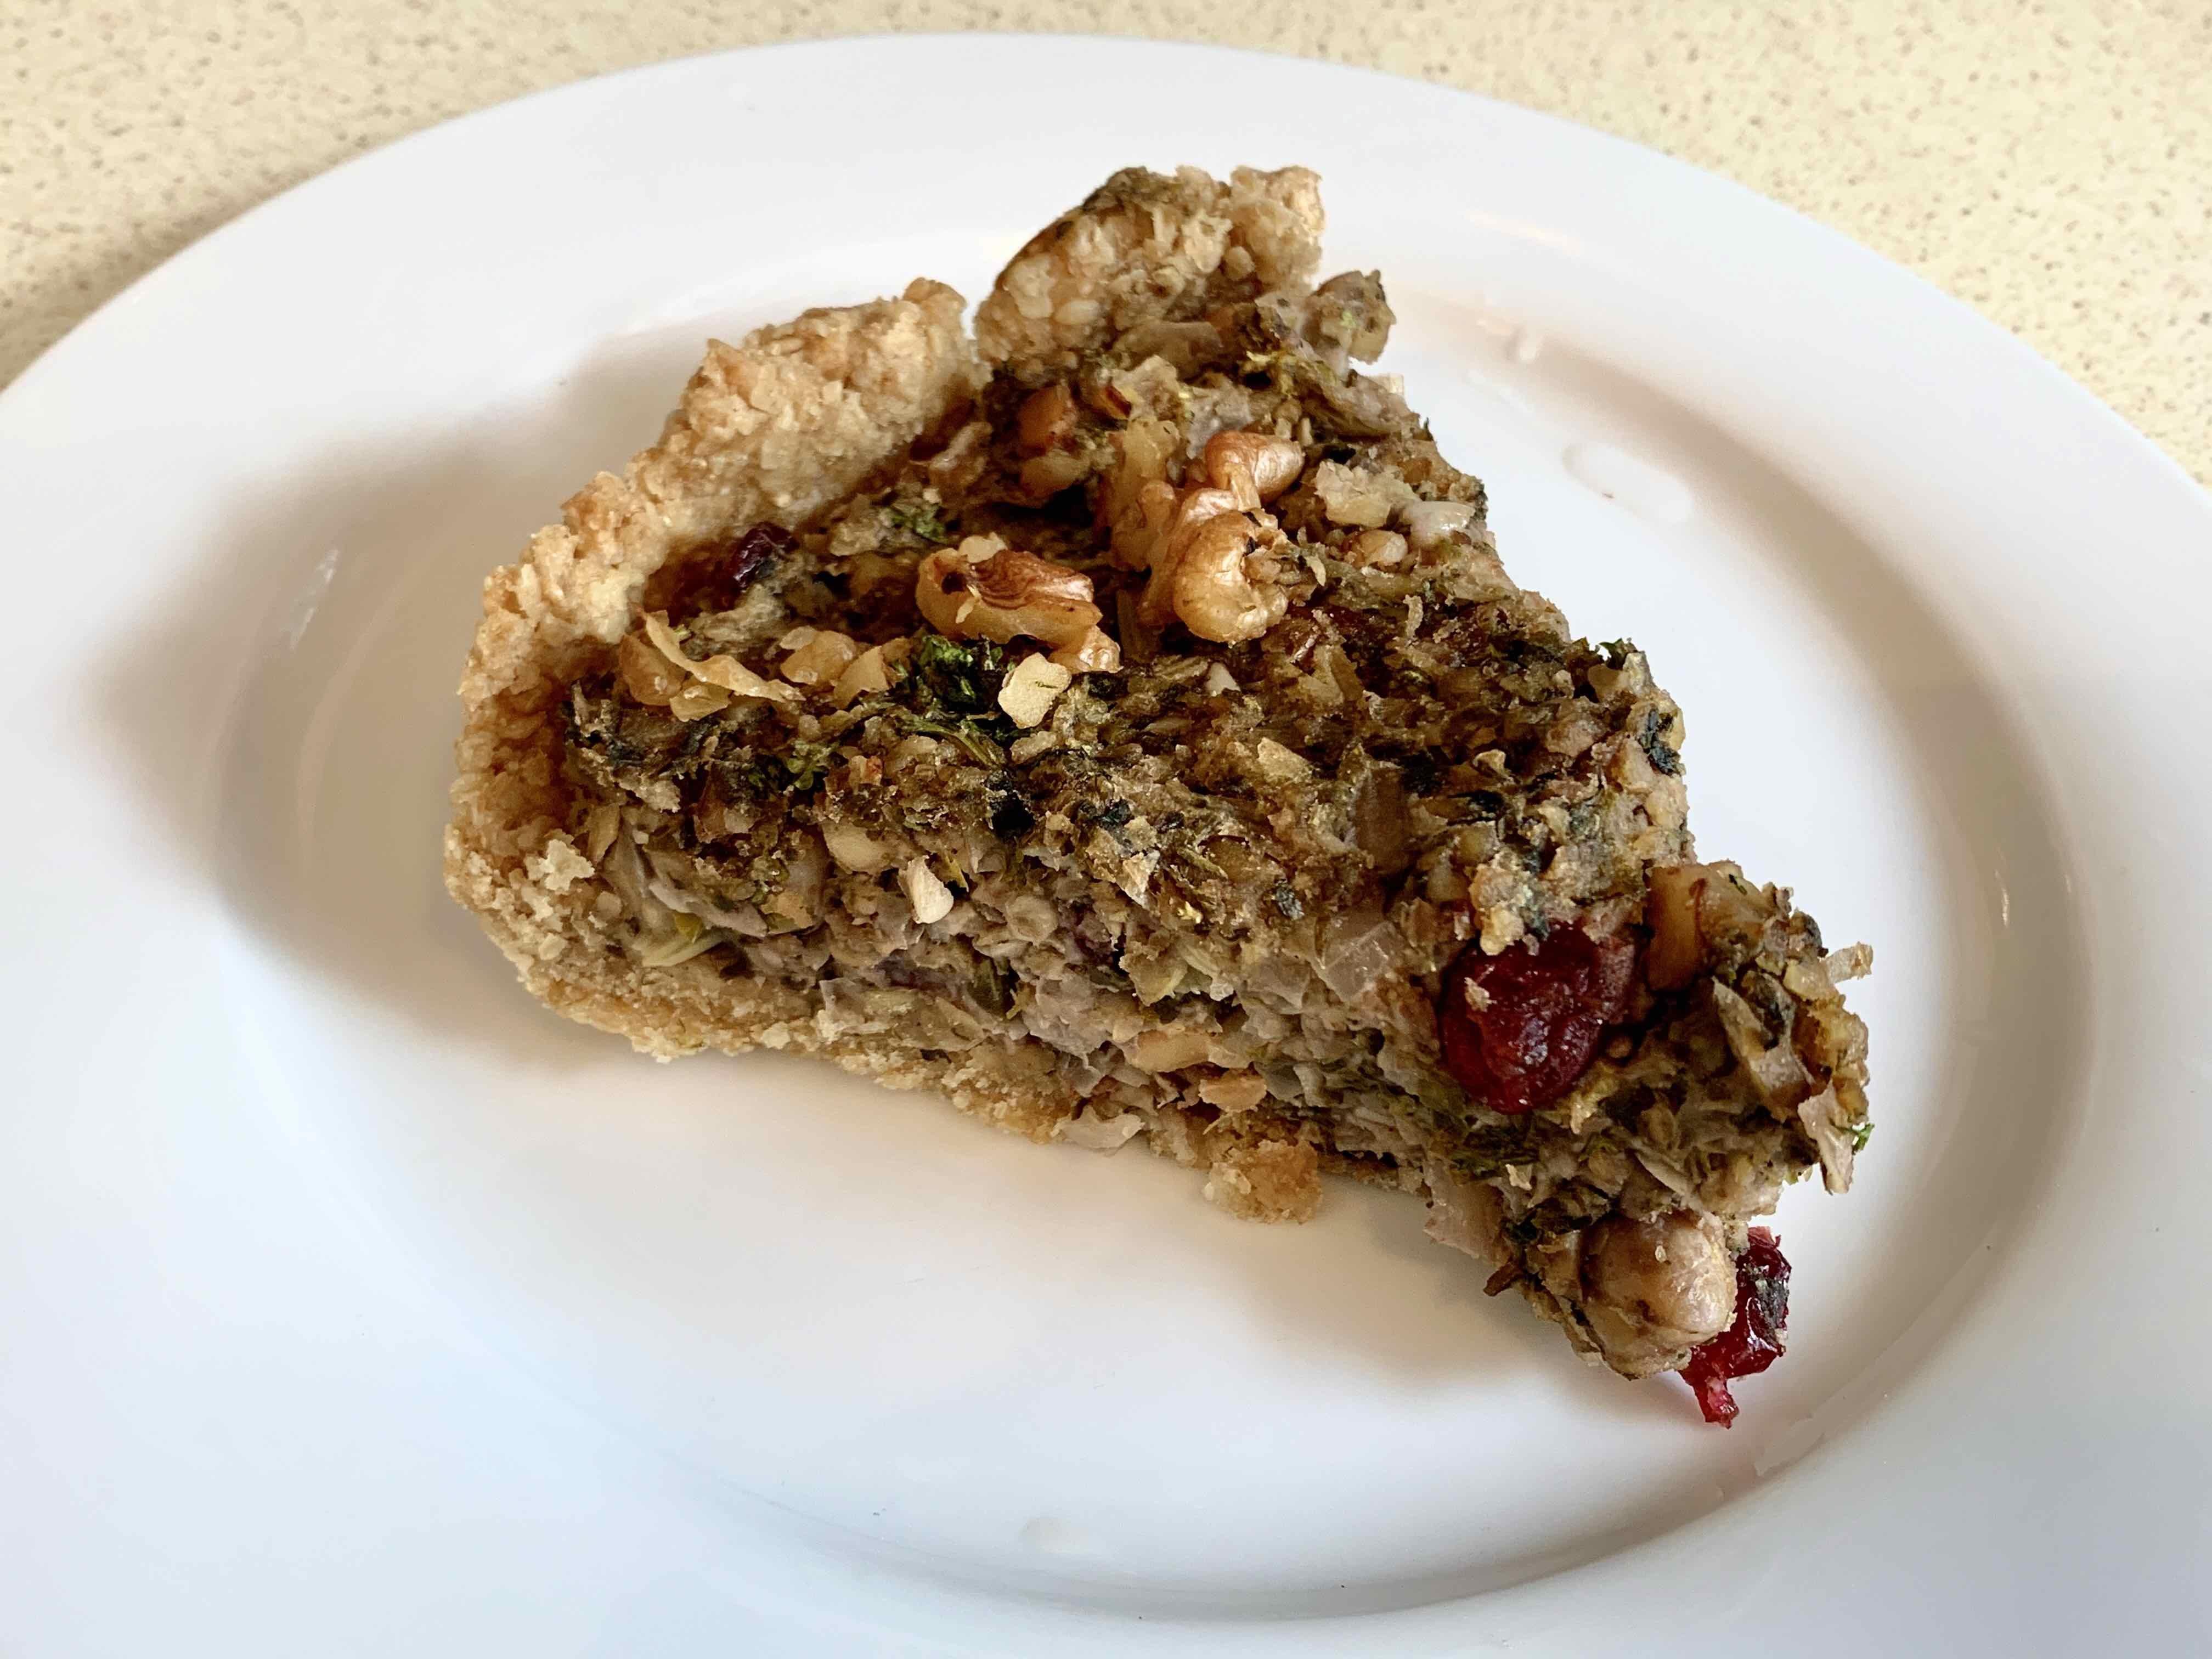 Chickpea, cranberry & walnut tart